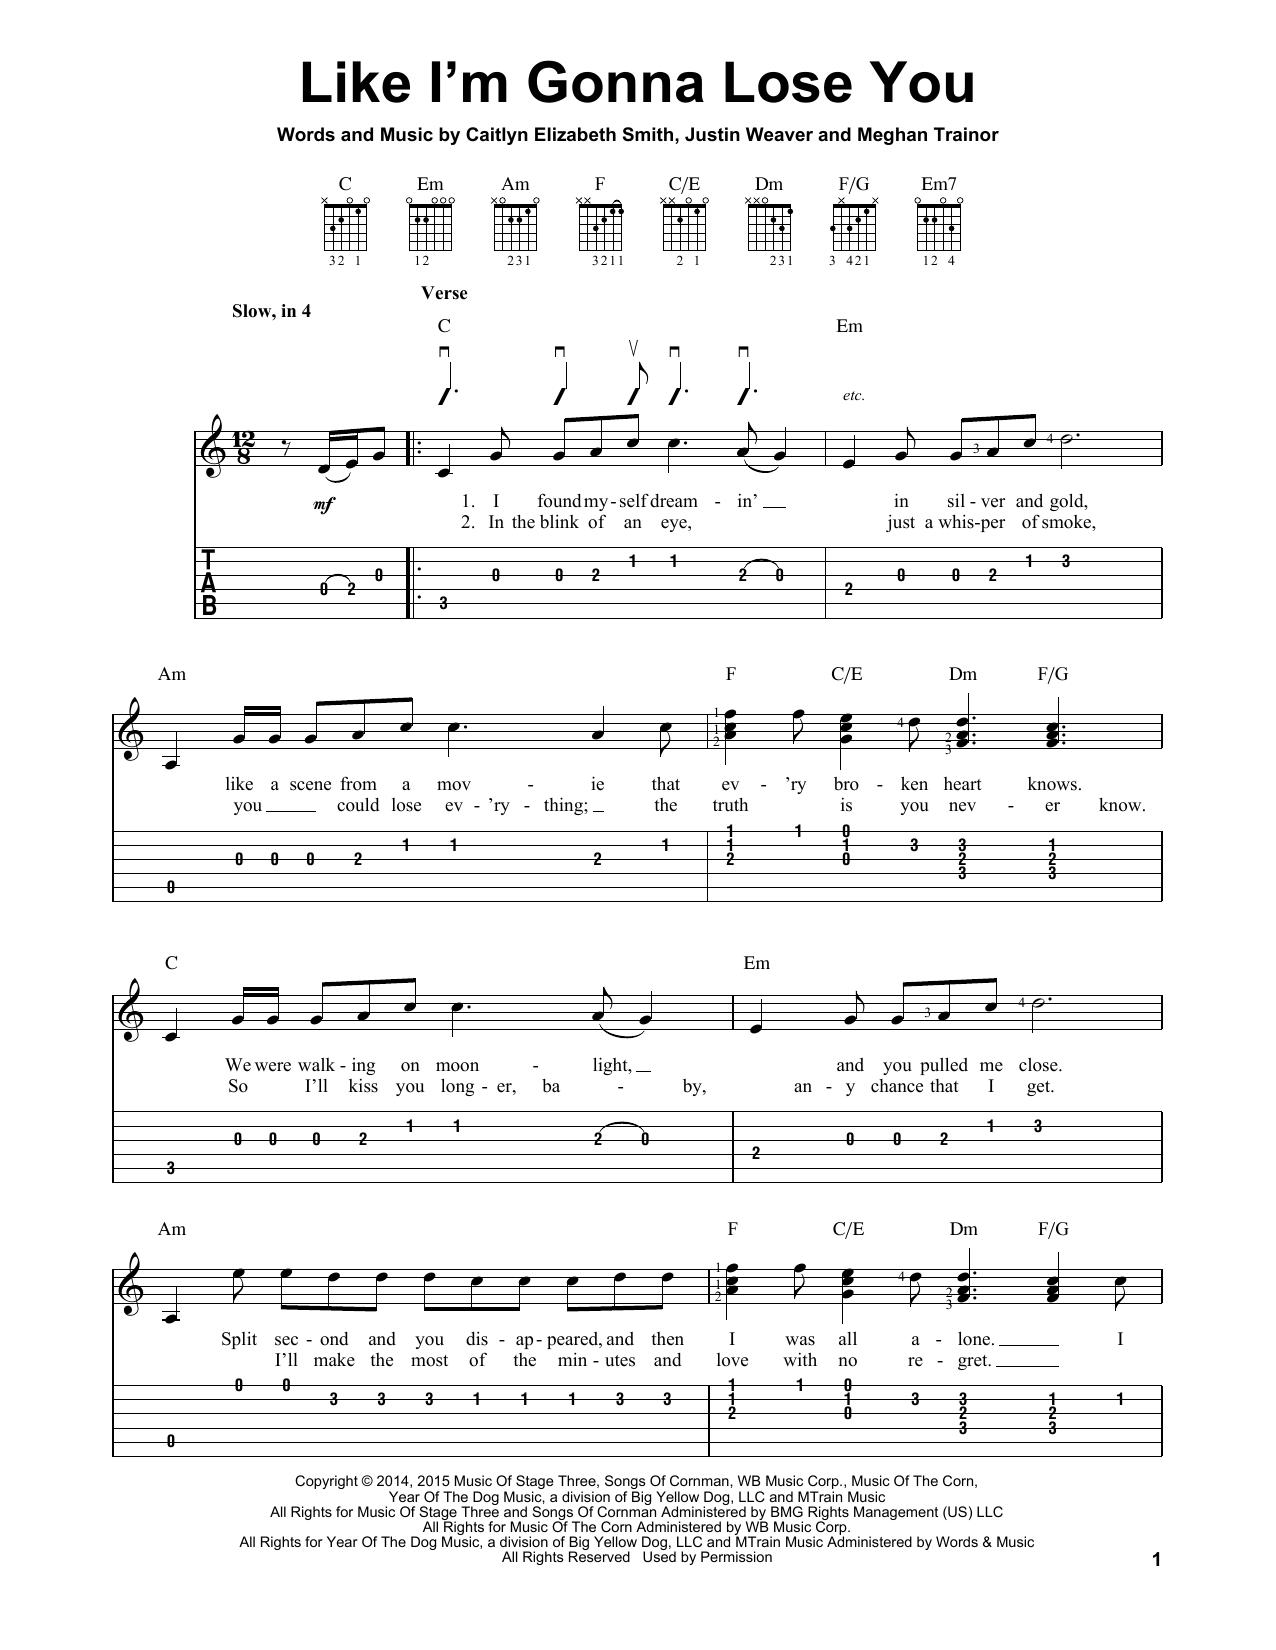 Sheet Music Digital Files To Print Licensed Justin Weaver Digital